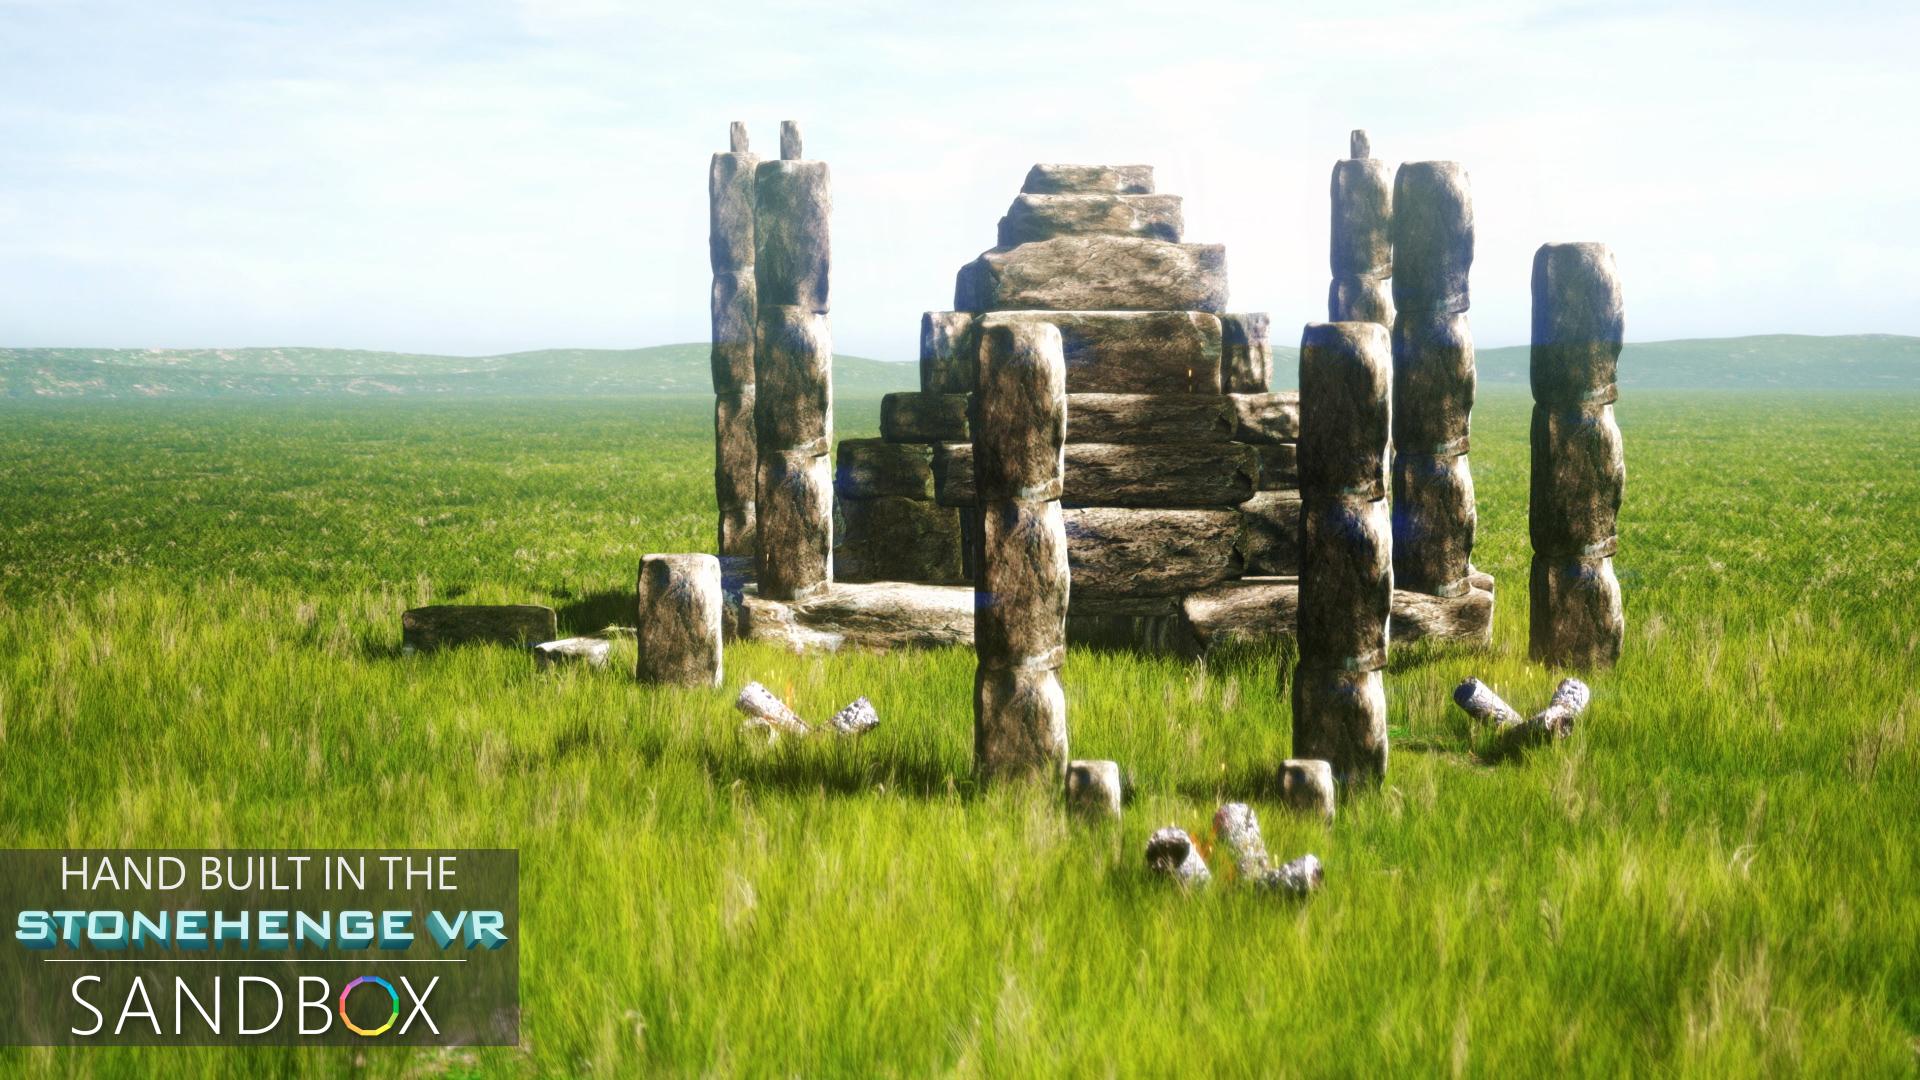 Stonehenge VR SANDBOX_SS_Hand Built Monument_01.jpg.jpg